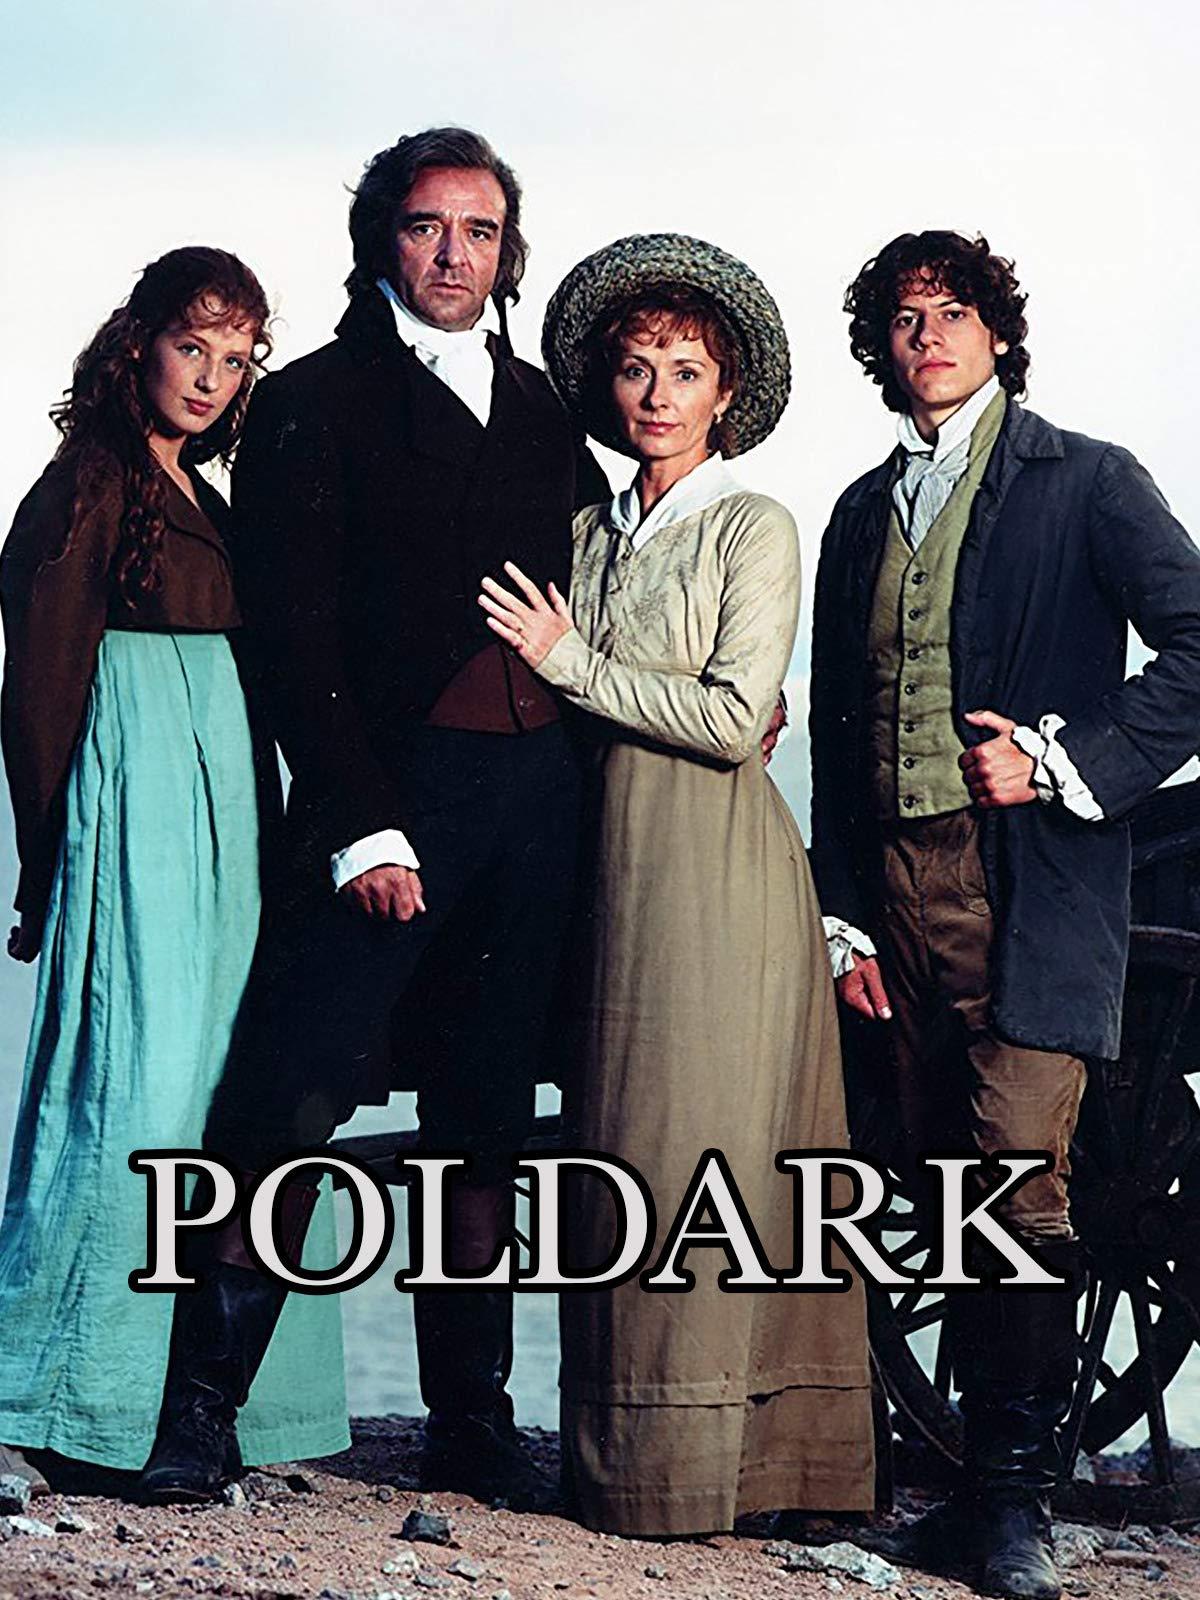 Amazon.com: Poldark: John Bowe, Mel Martin, Michael Attwell, Ioan ...